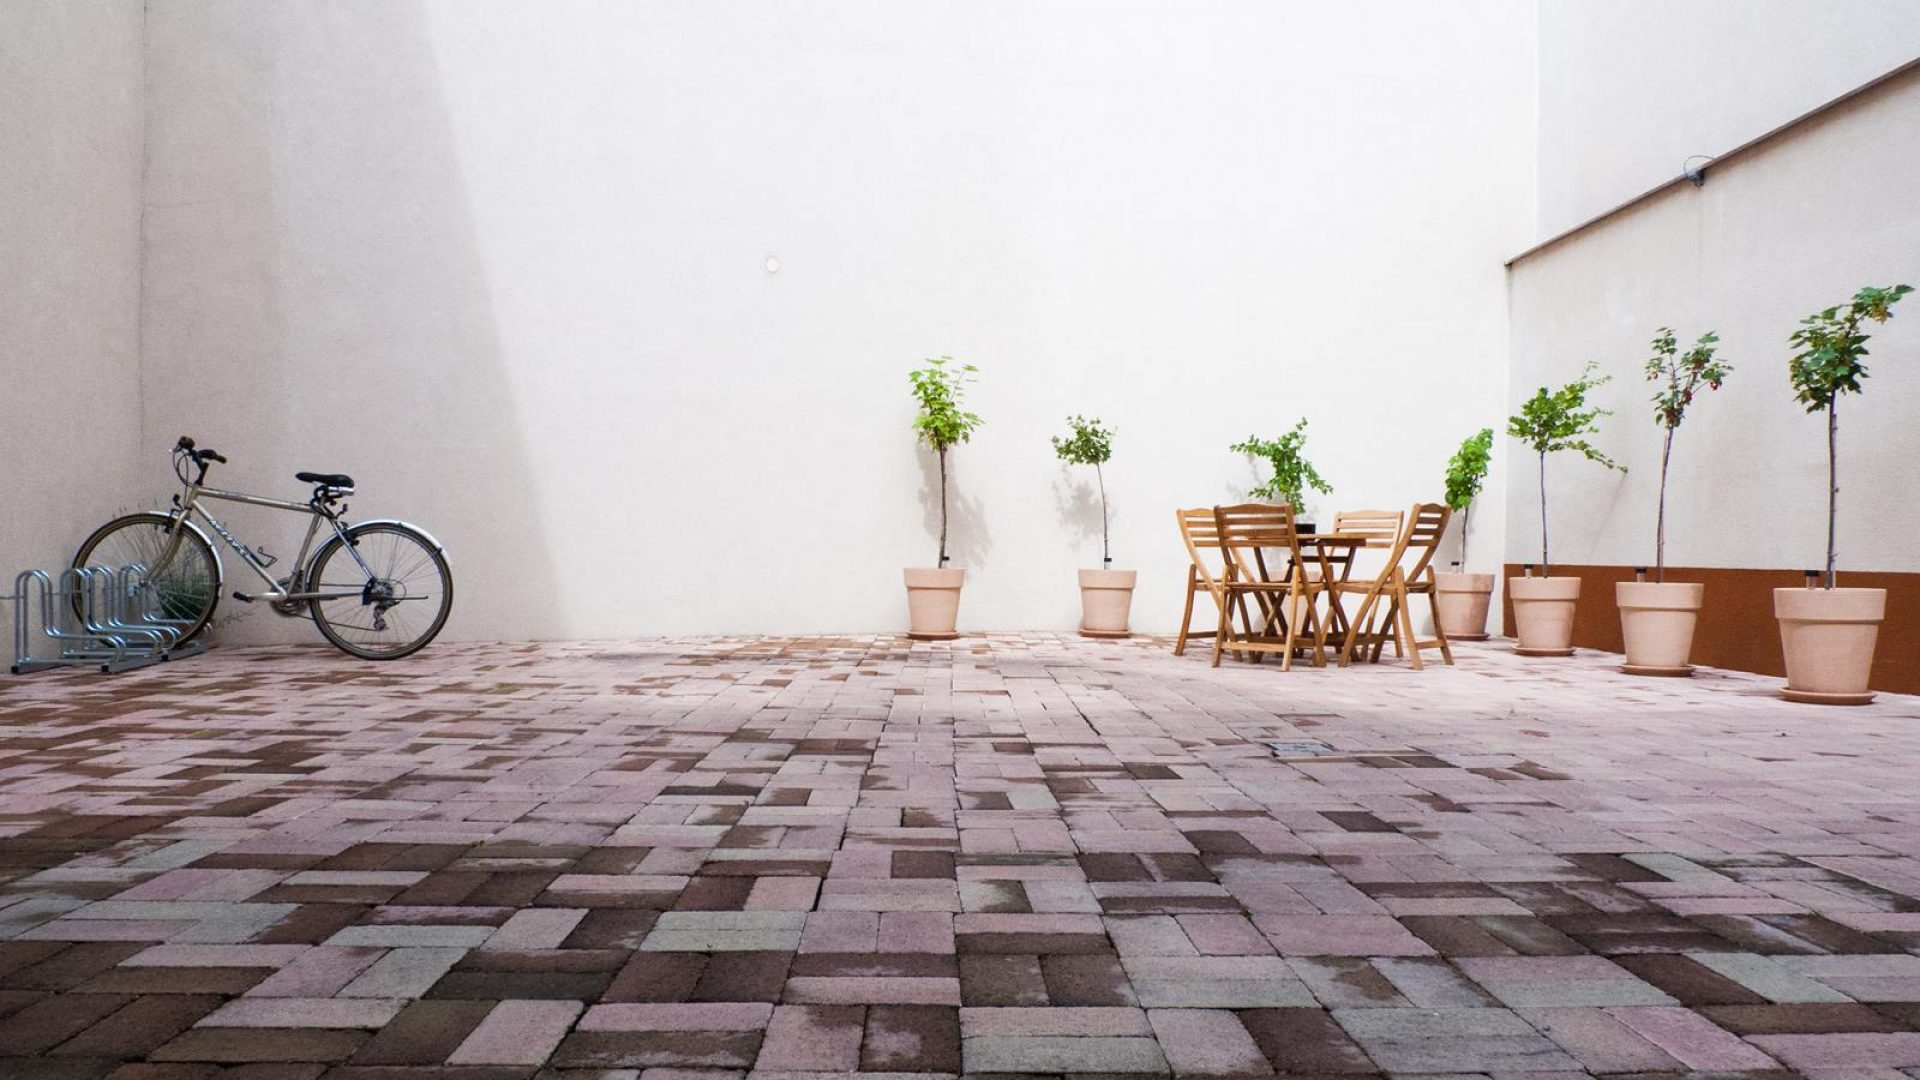 Terasa & Parkovisko pre bicykle a motorky.